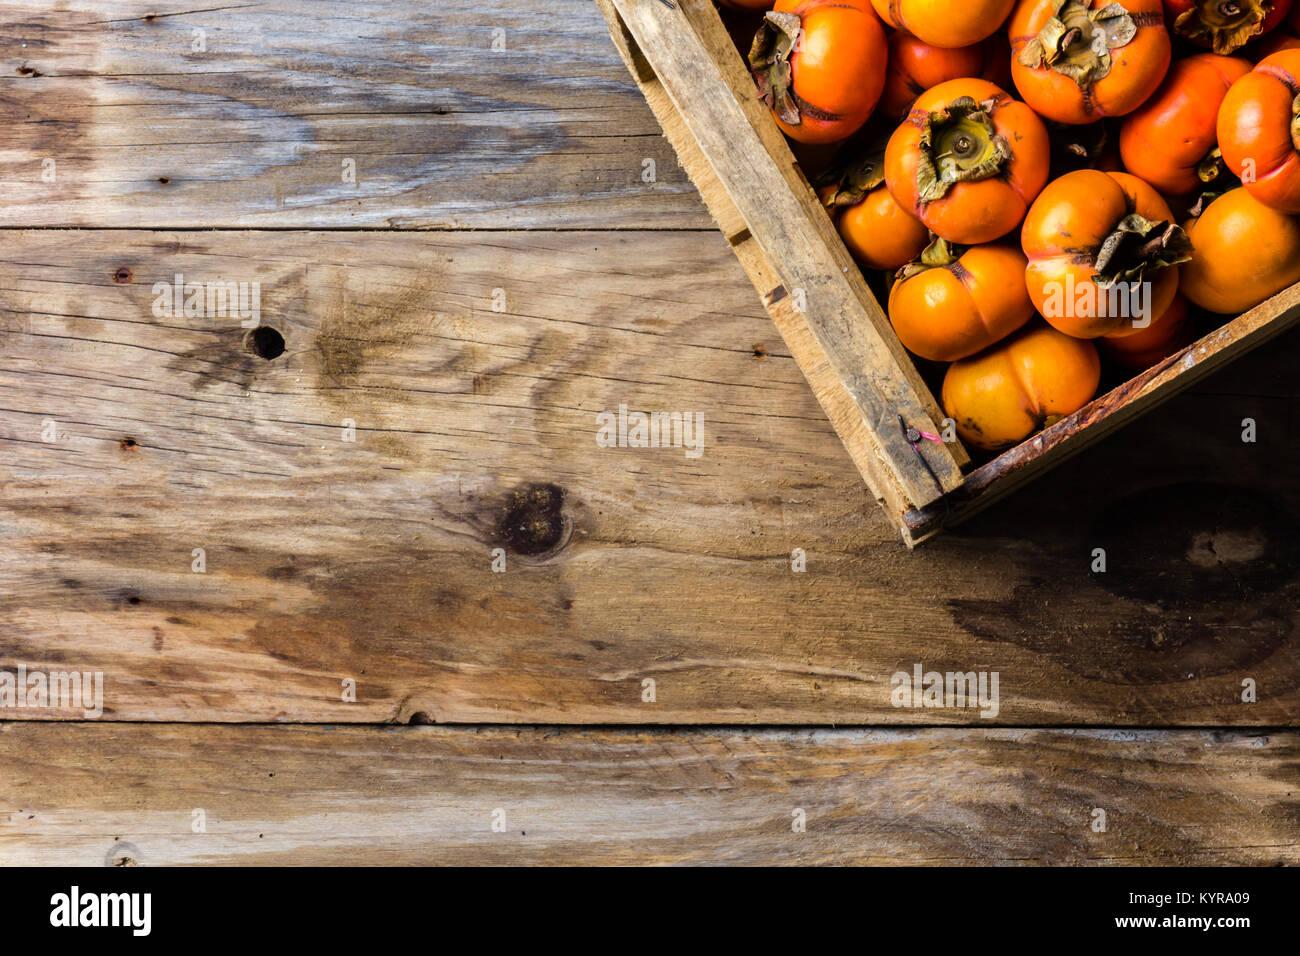 Caja de frutas frescas caqui kaki sobre fondo de madera vieja. Espacio de copia Imagen De Stock